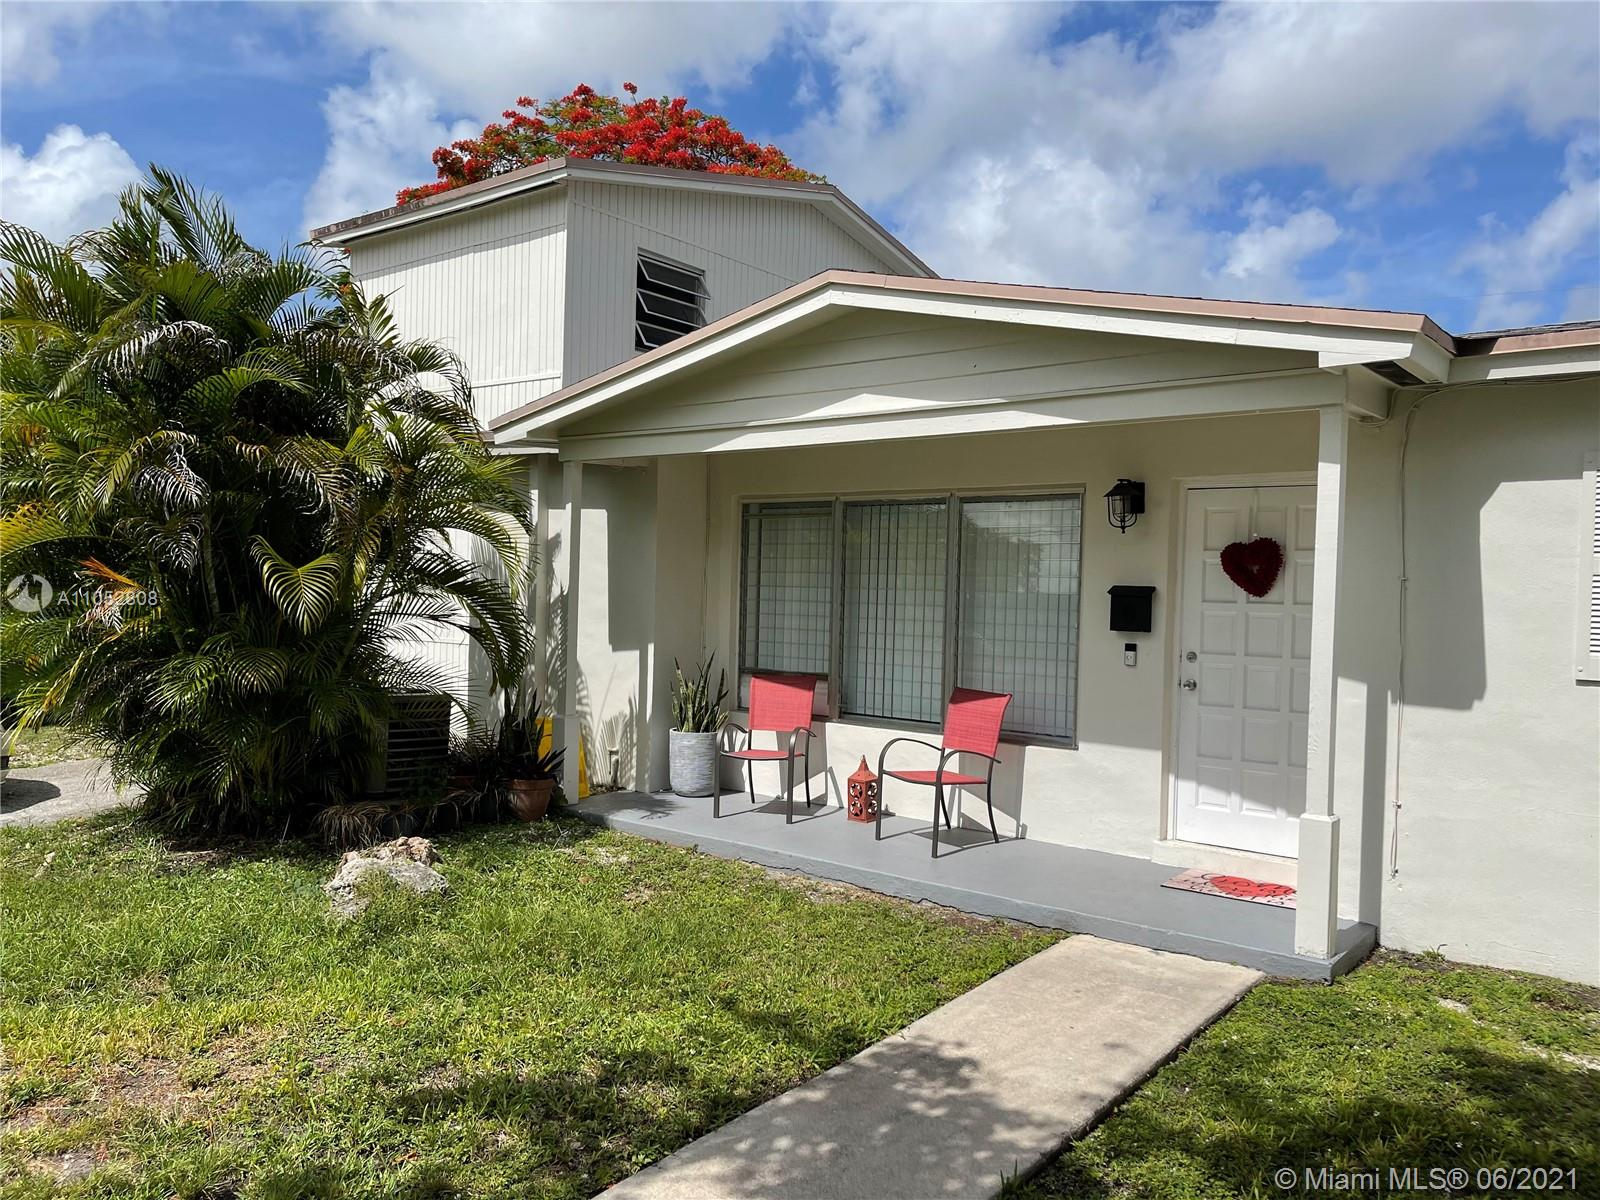 Coral Park Estates - 1415 SW 93rd Pl, Miami, FL 33174